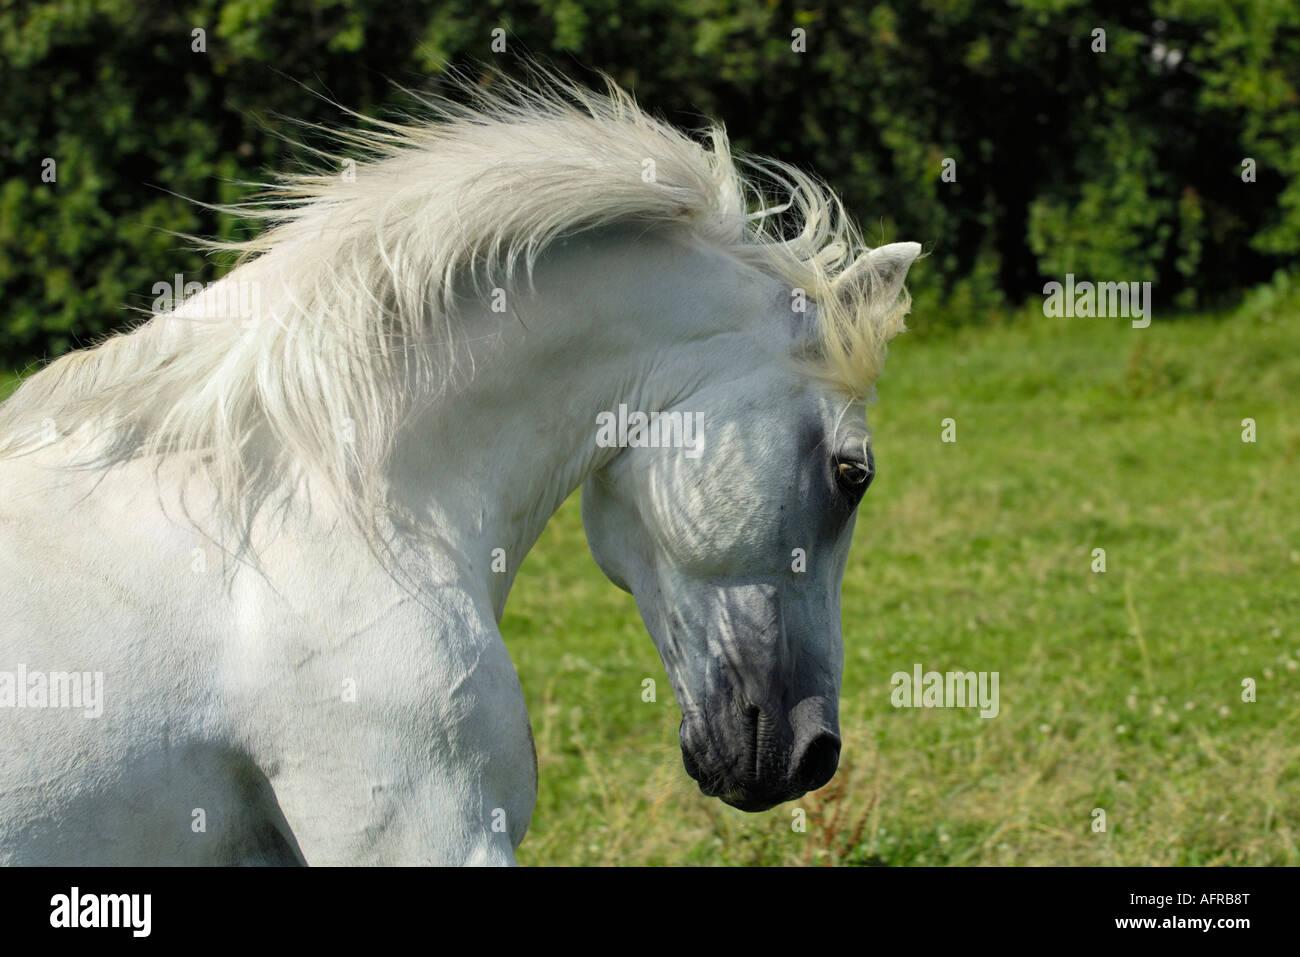 Connemara pony stallion - Stock Image